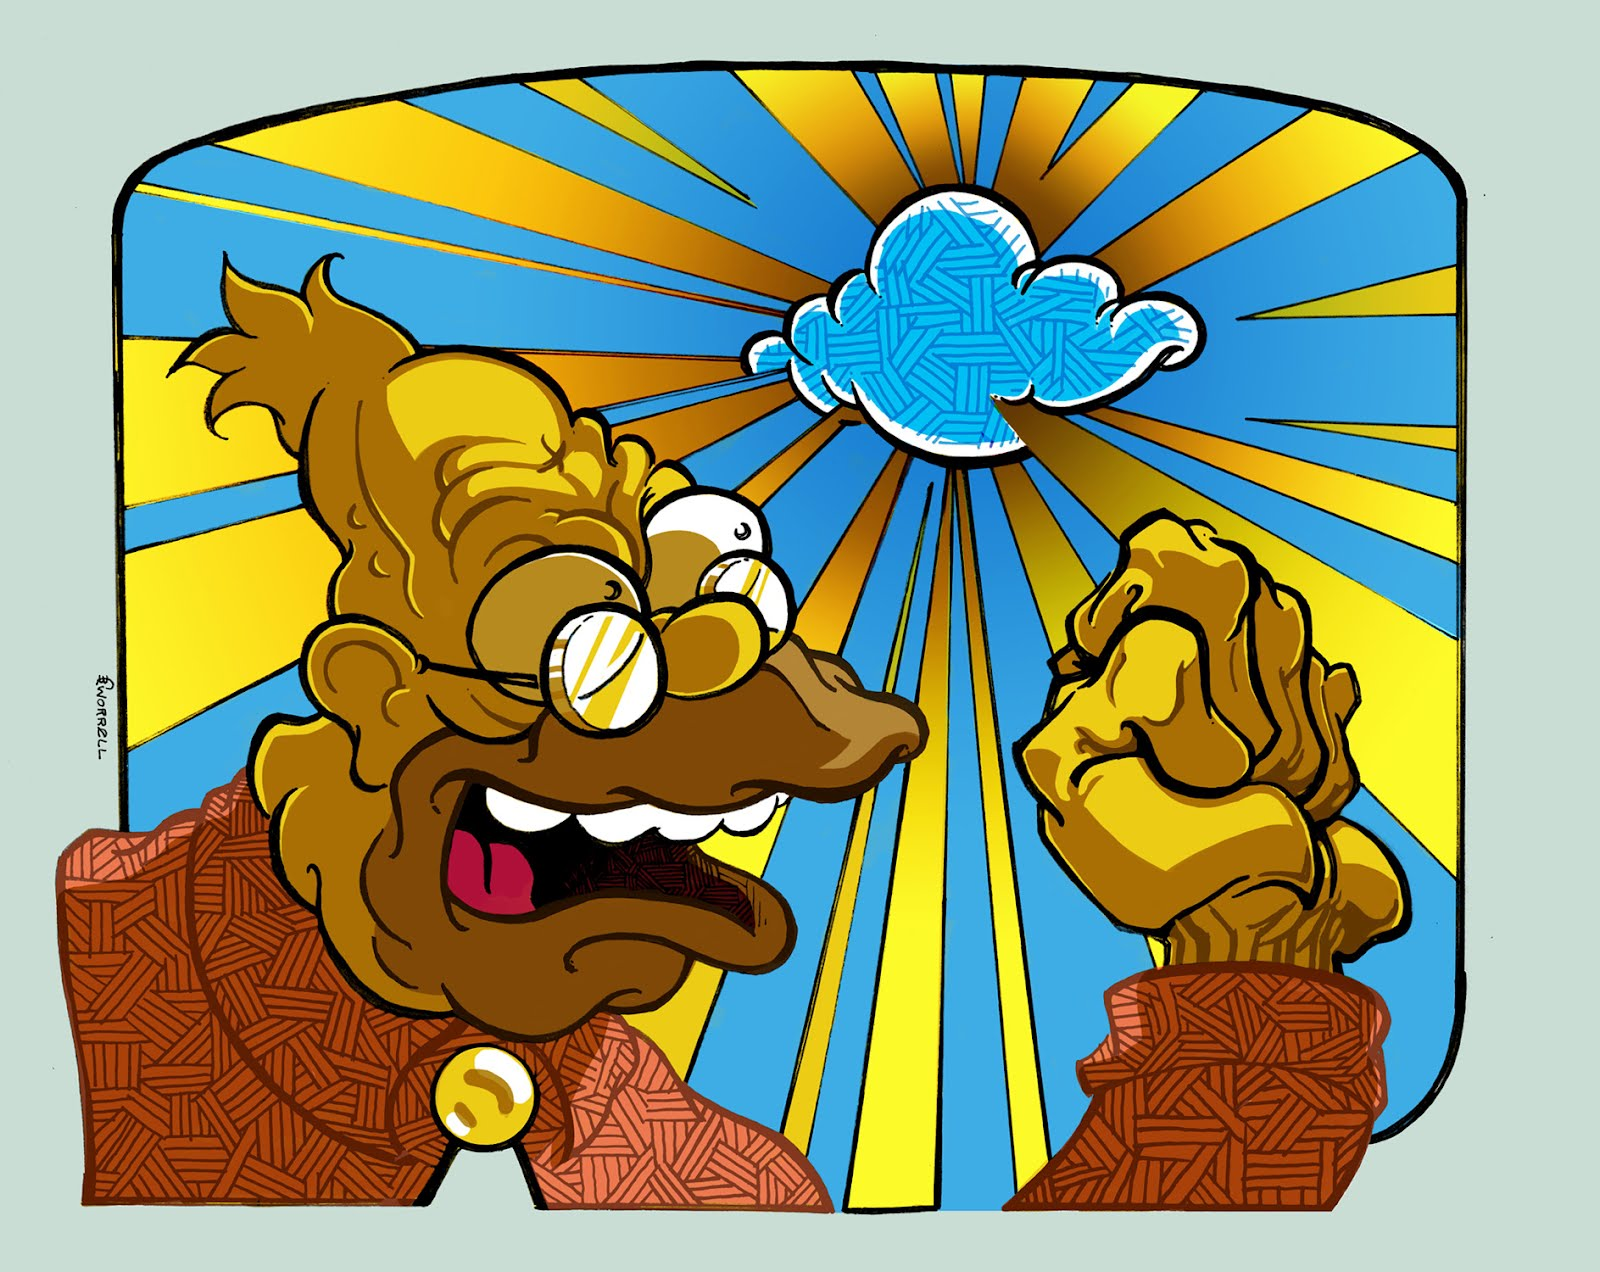 Round 12: The Simpsons